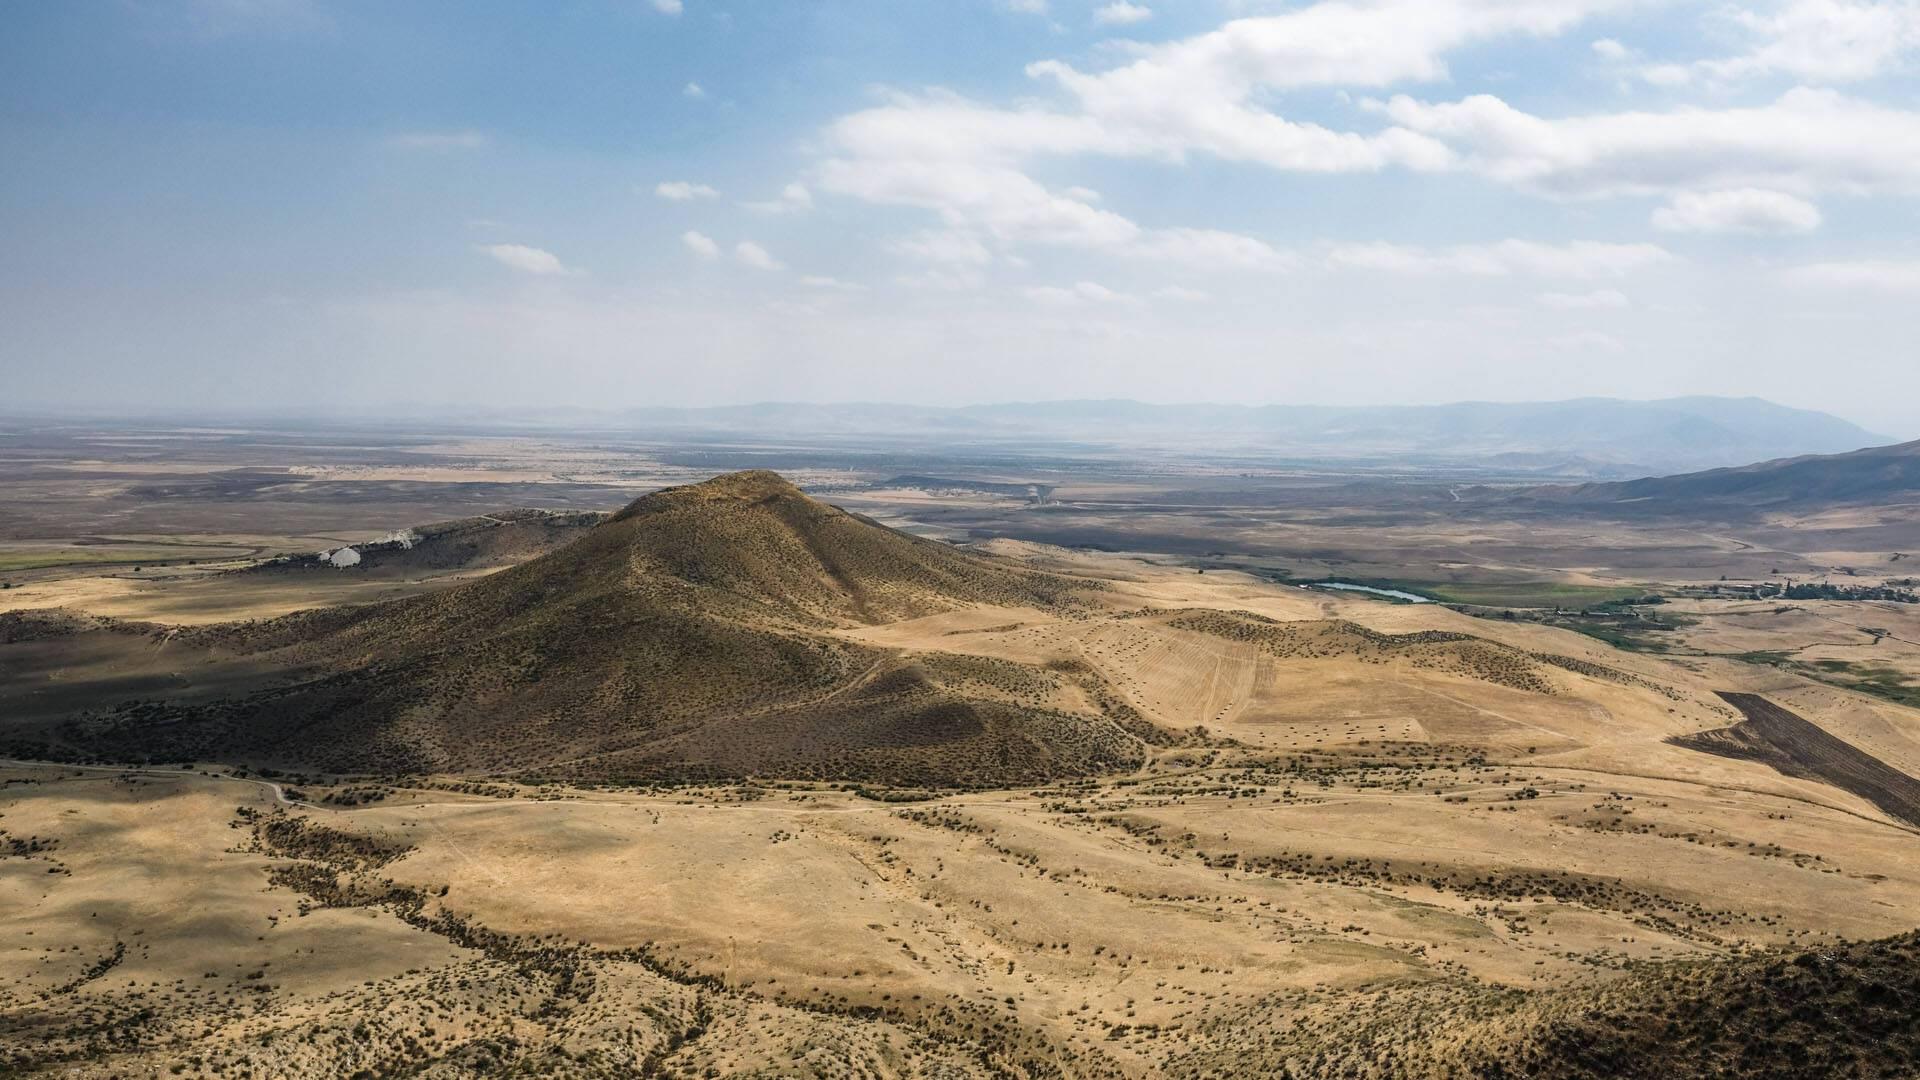 Circuit Armenie spaceview